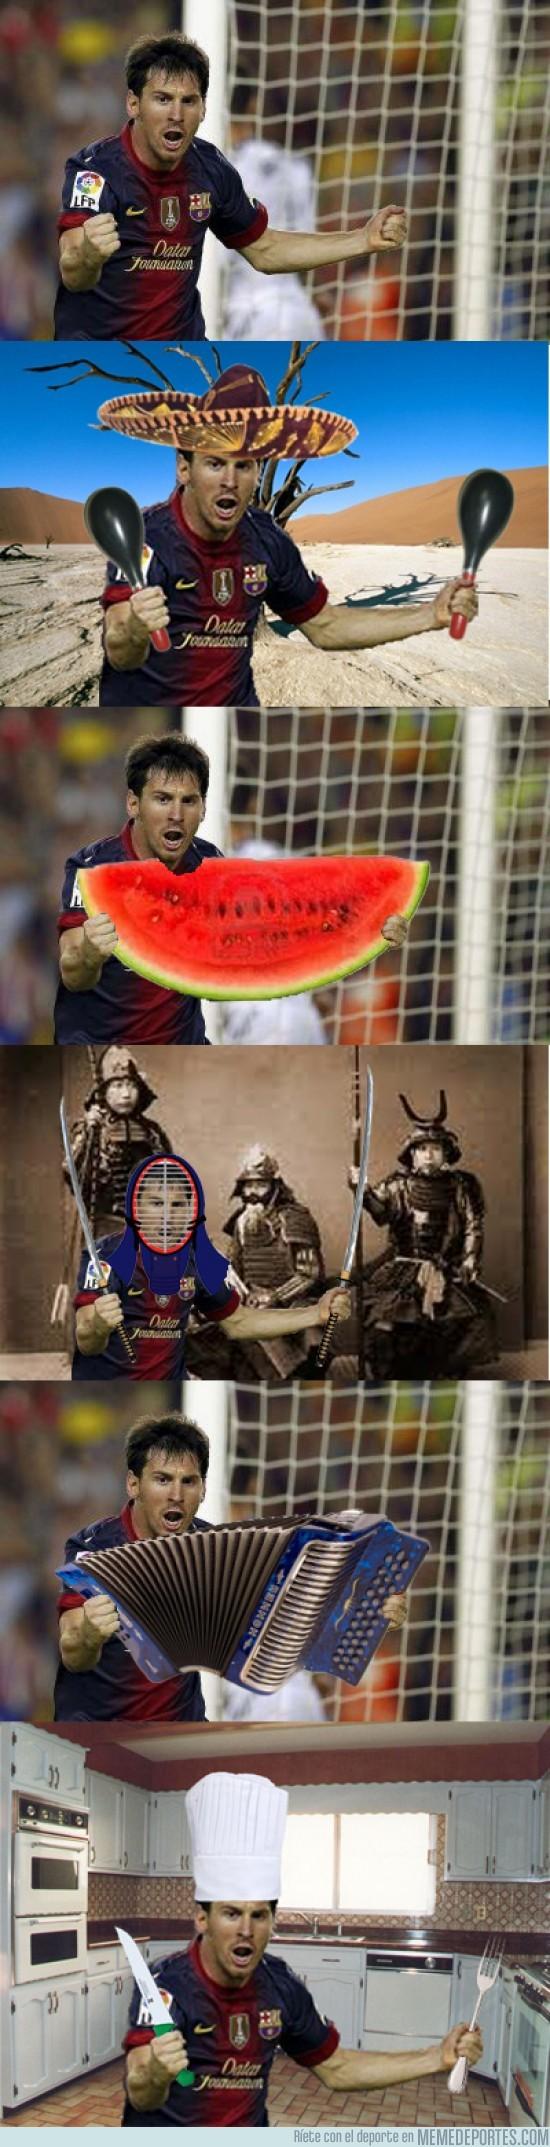 33626 - Chopeando a Messi